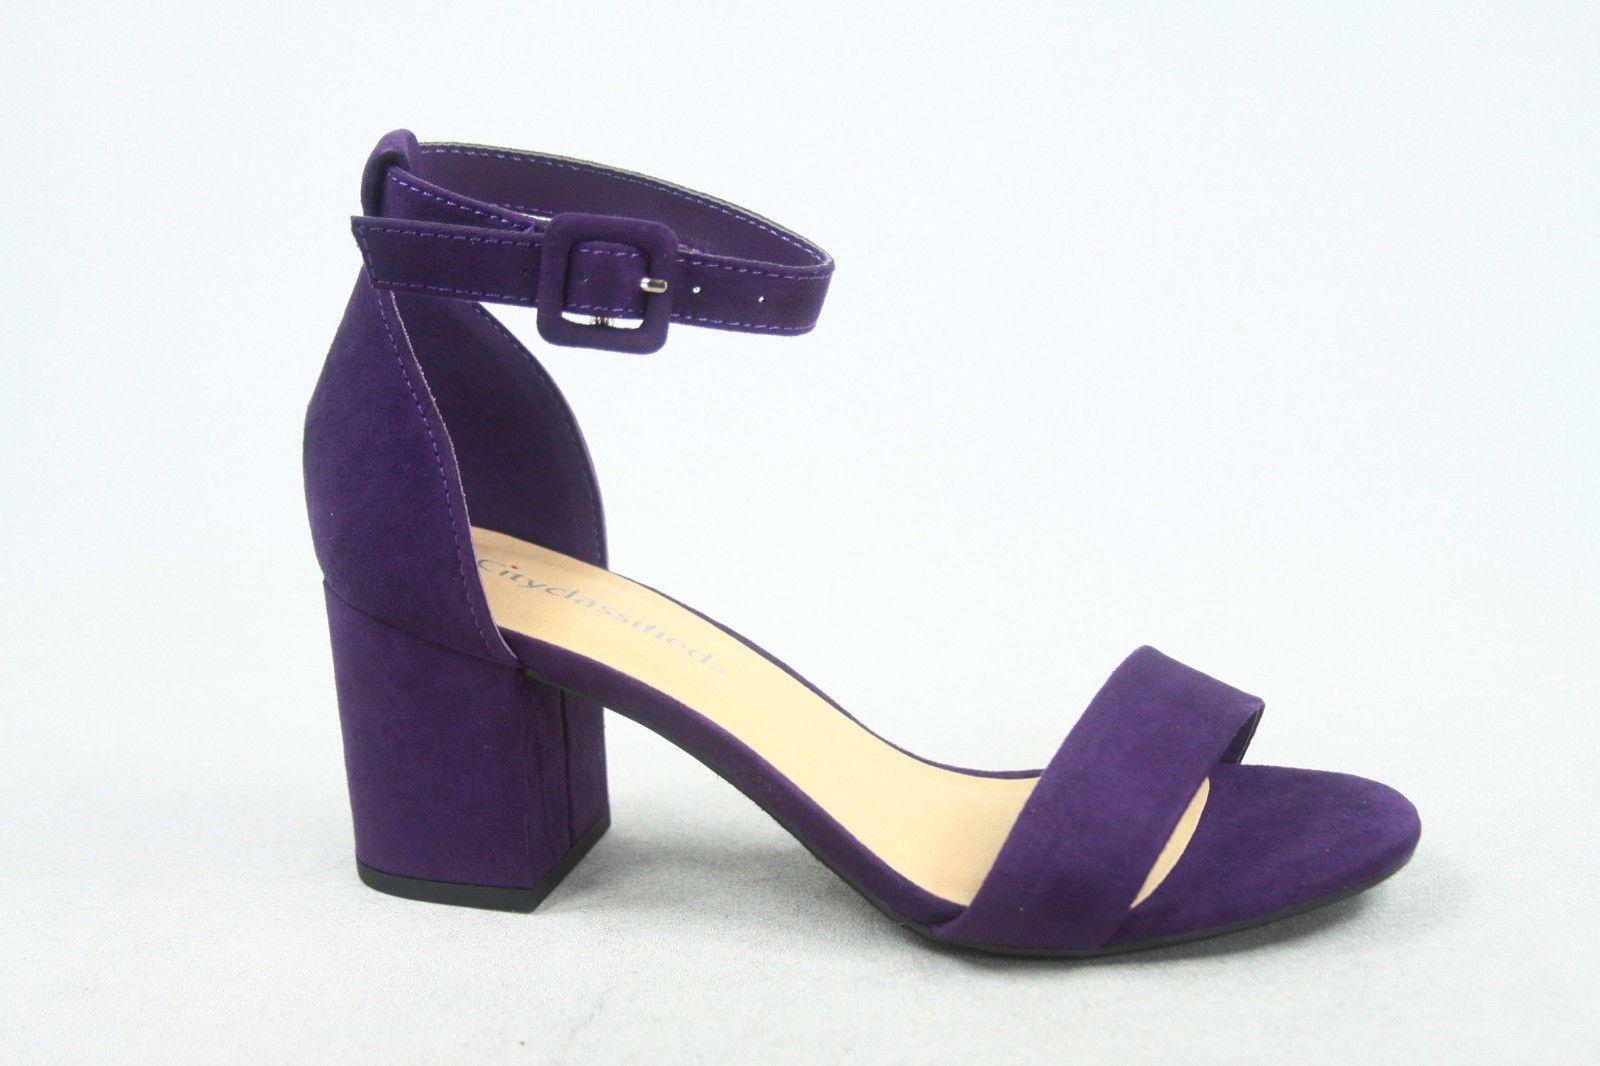 NEW Strap Heel Sandal Size